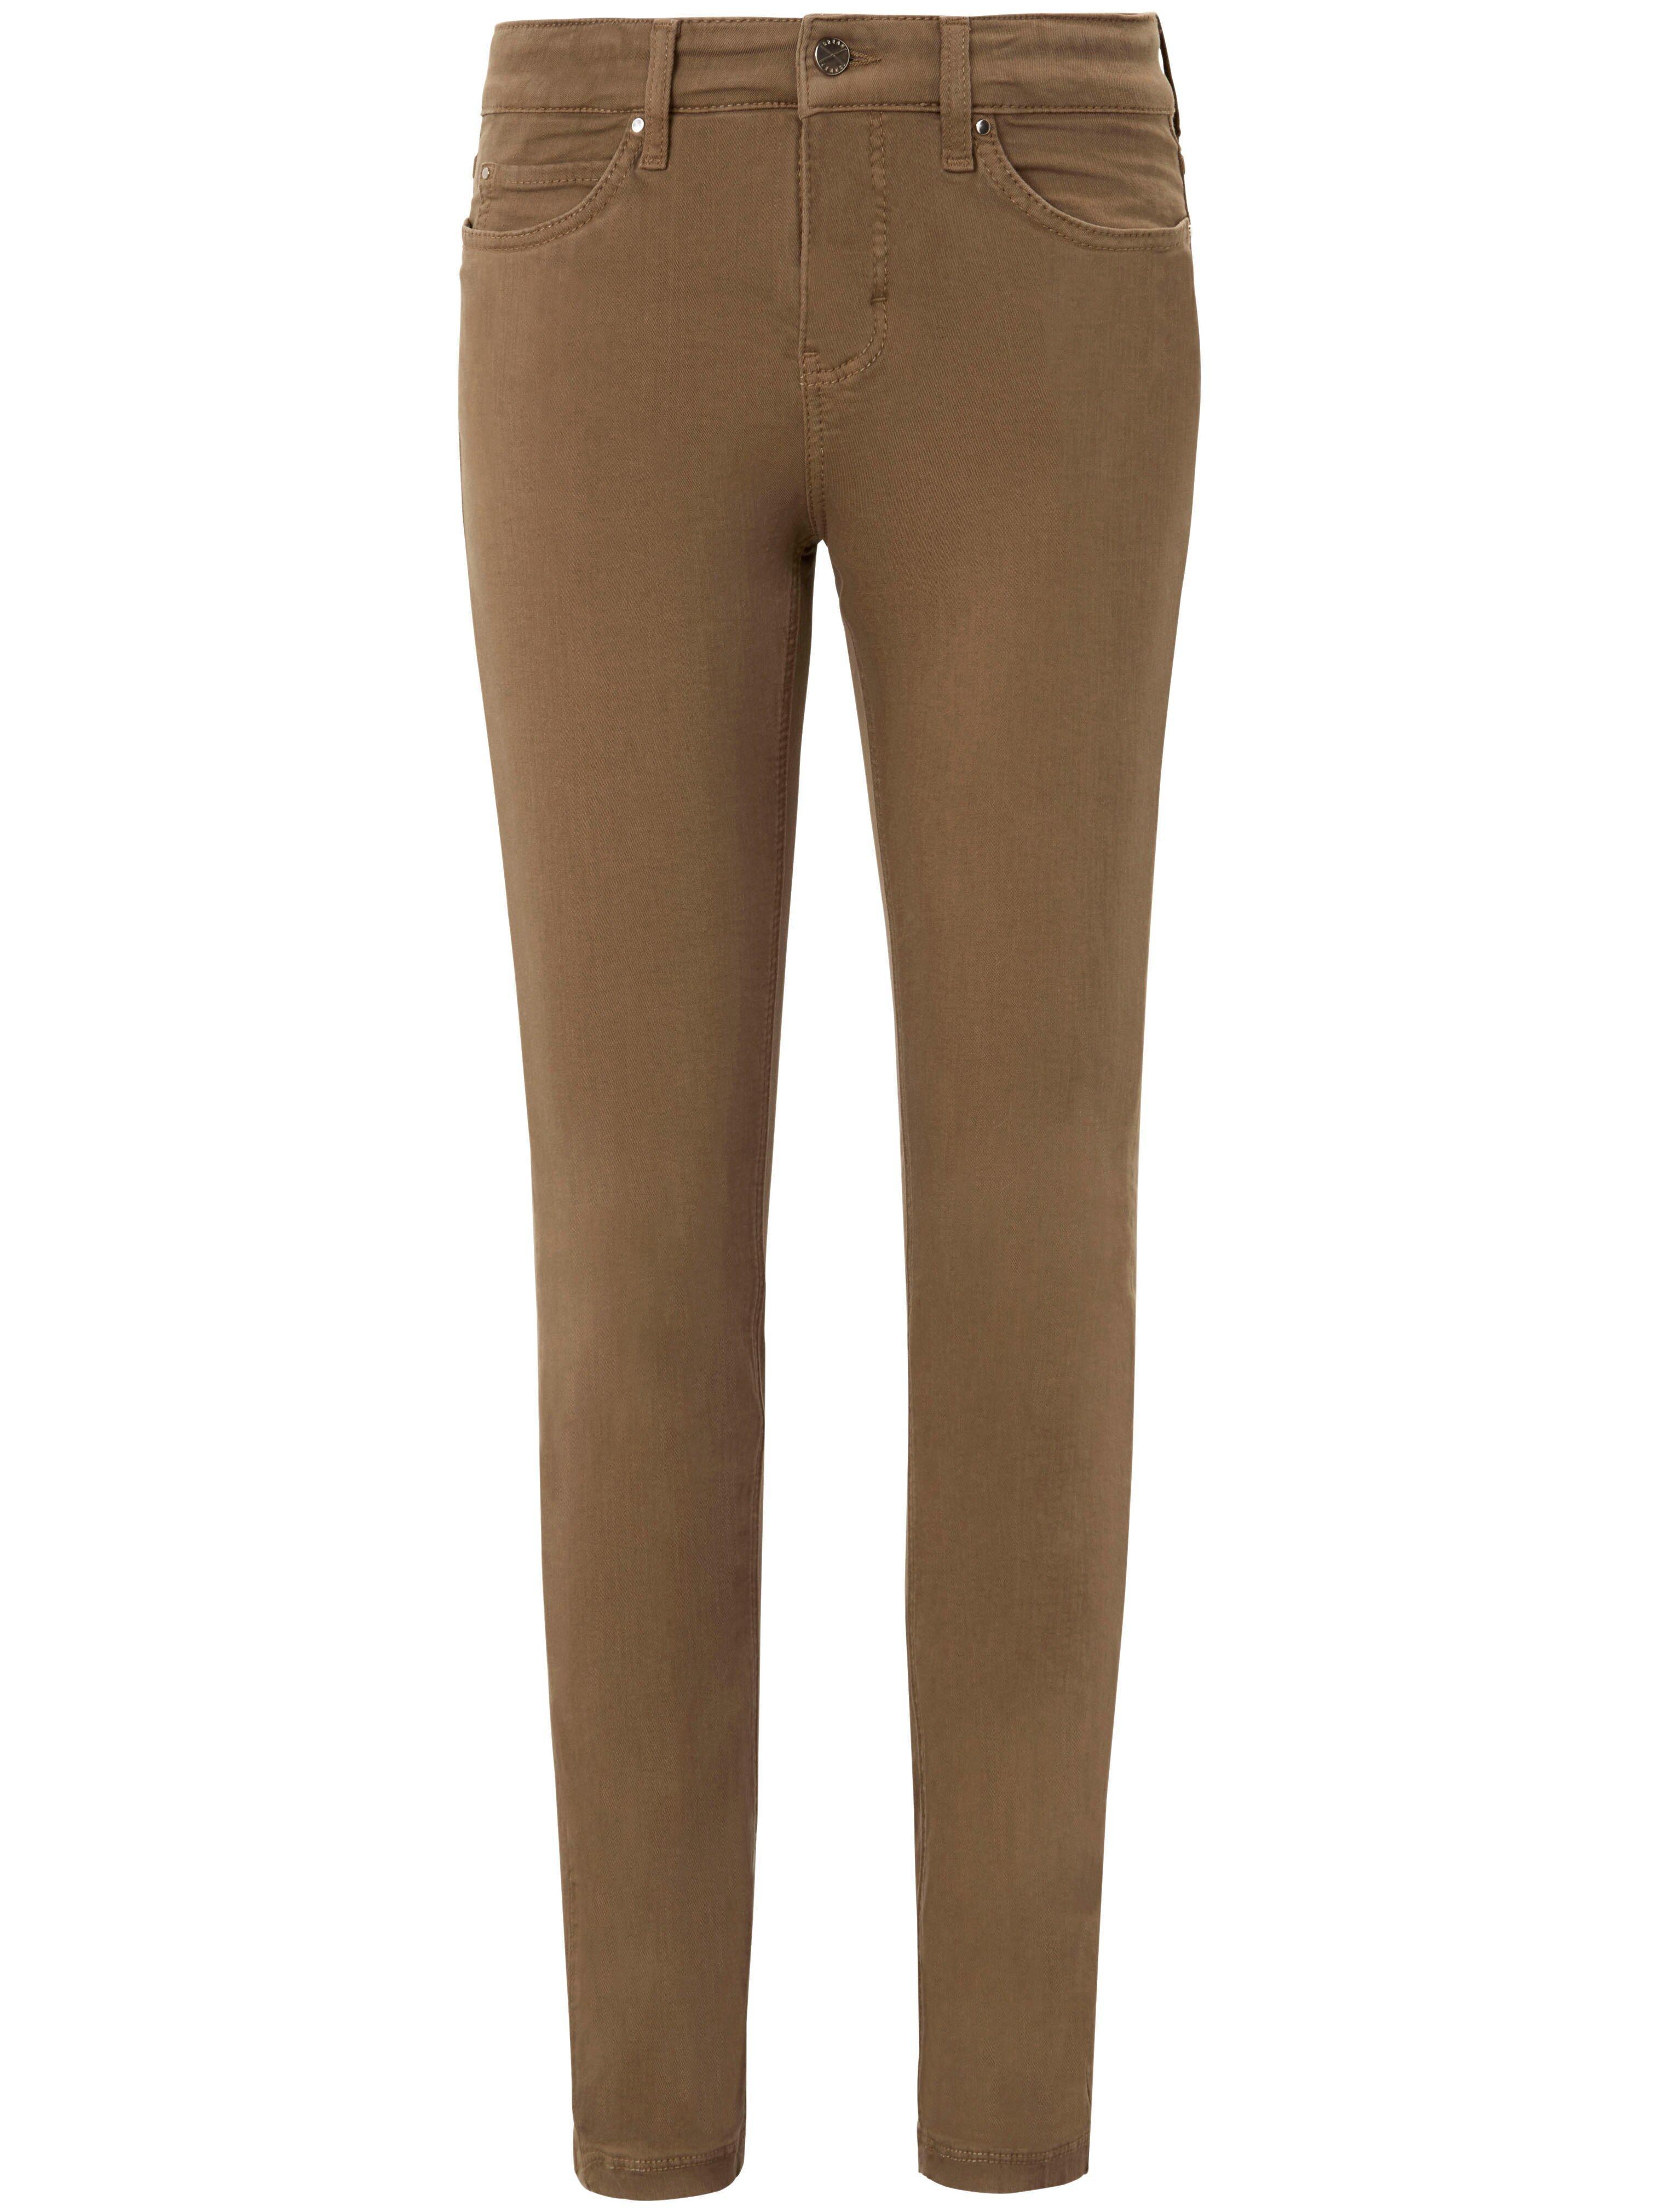 Damen Jeans Dream Skinny in 28-Inch Mac beige | Plus Size | 04059347730749